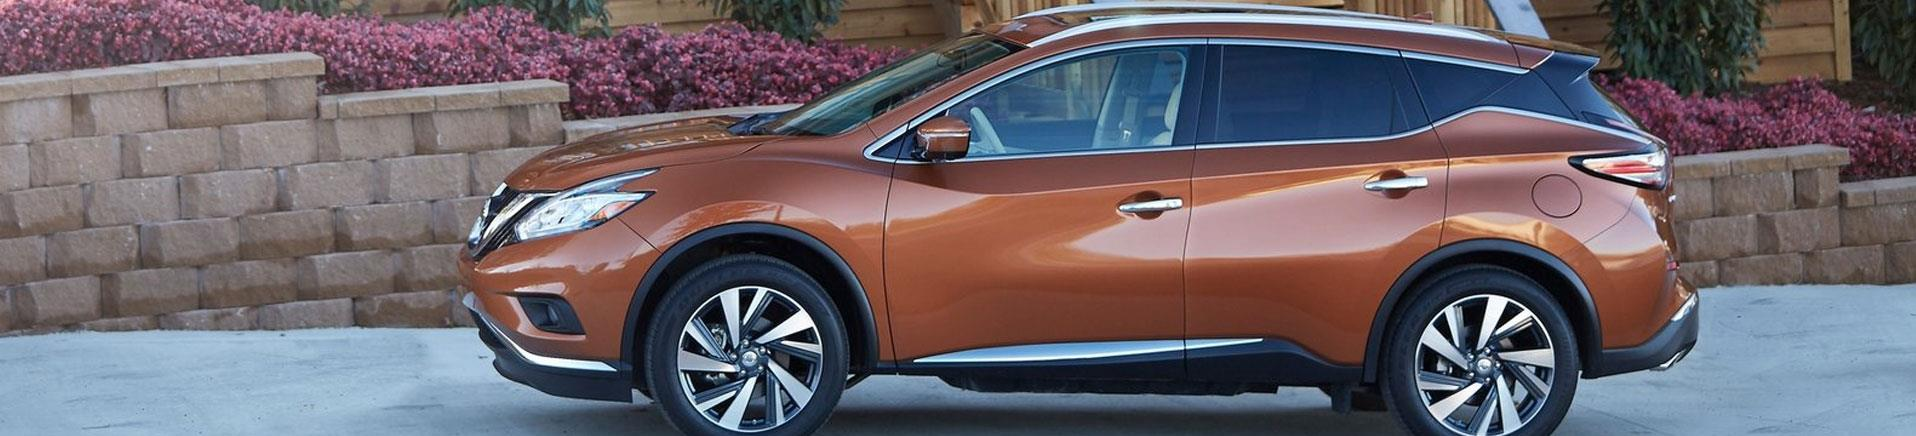 Used cars fredericksburg va used cars trucks va fox for Fox motors used cars